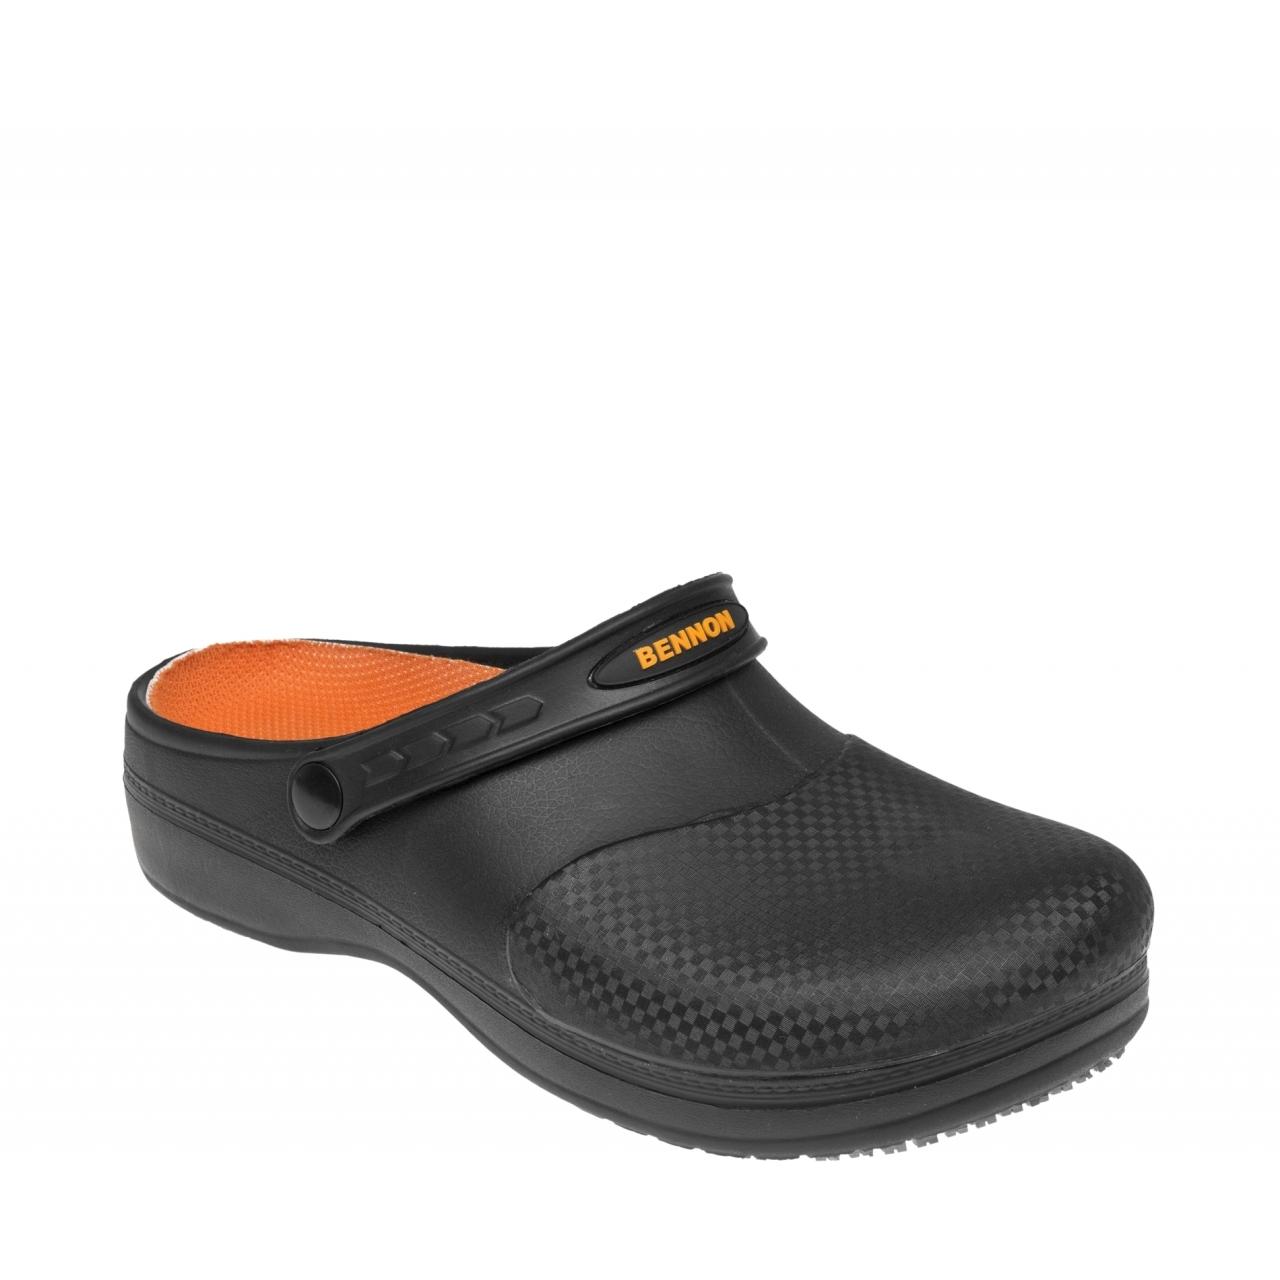 Sandále Bennon Maxim OB Slipper Easy - černé